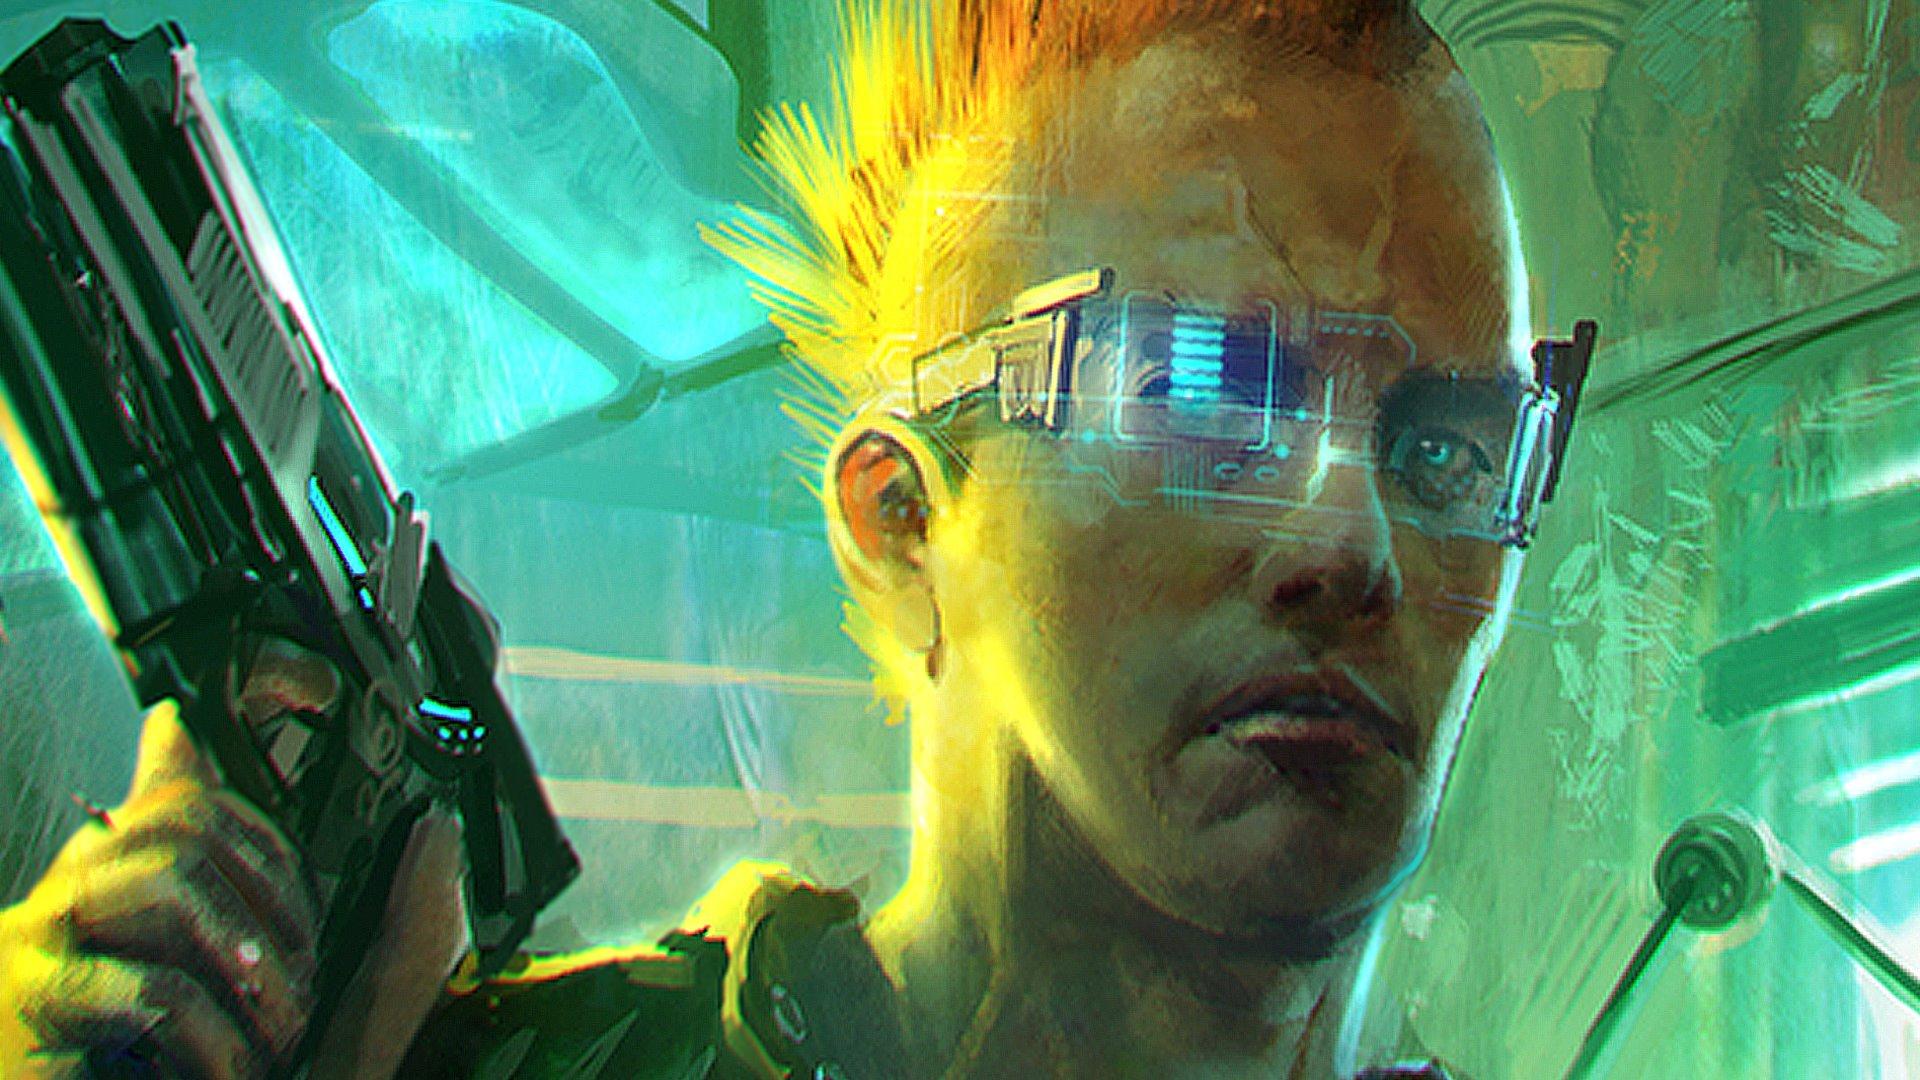 Cyberpunk 2077 HD Wallpaper | Background Image | 1920x1080 ...